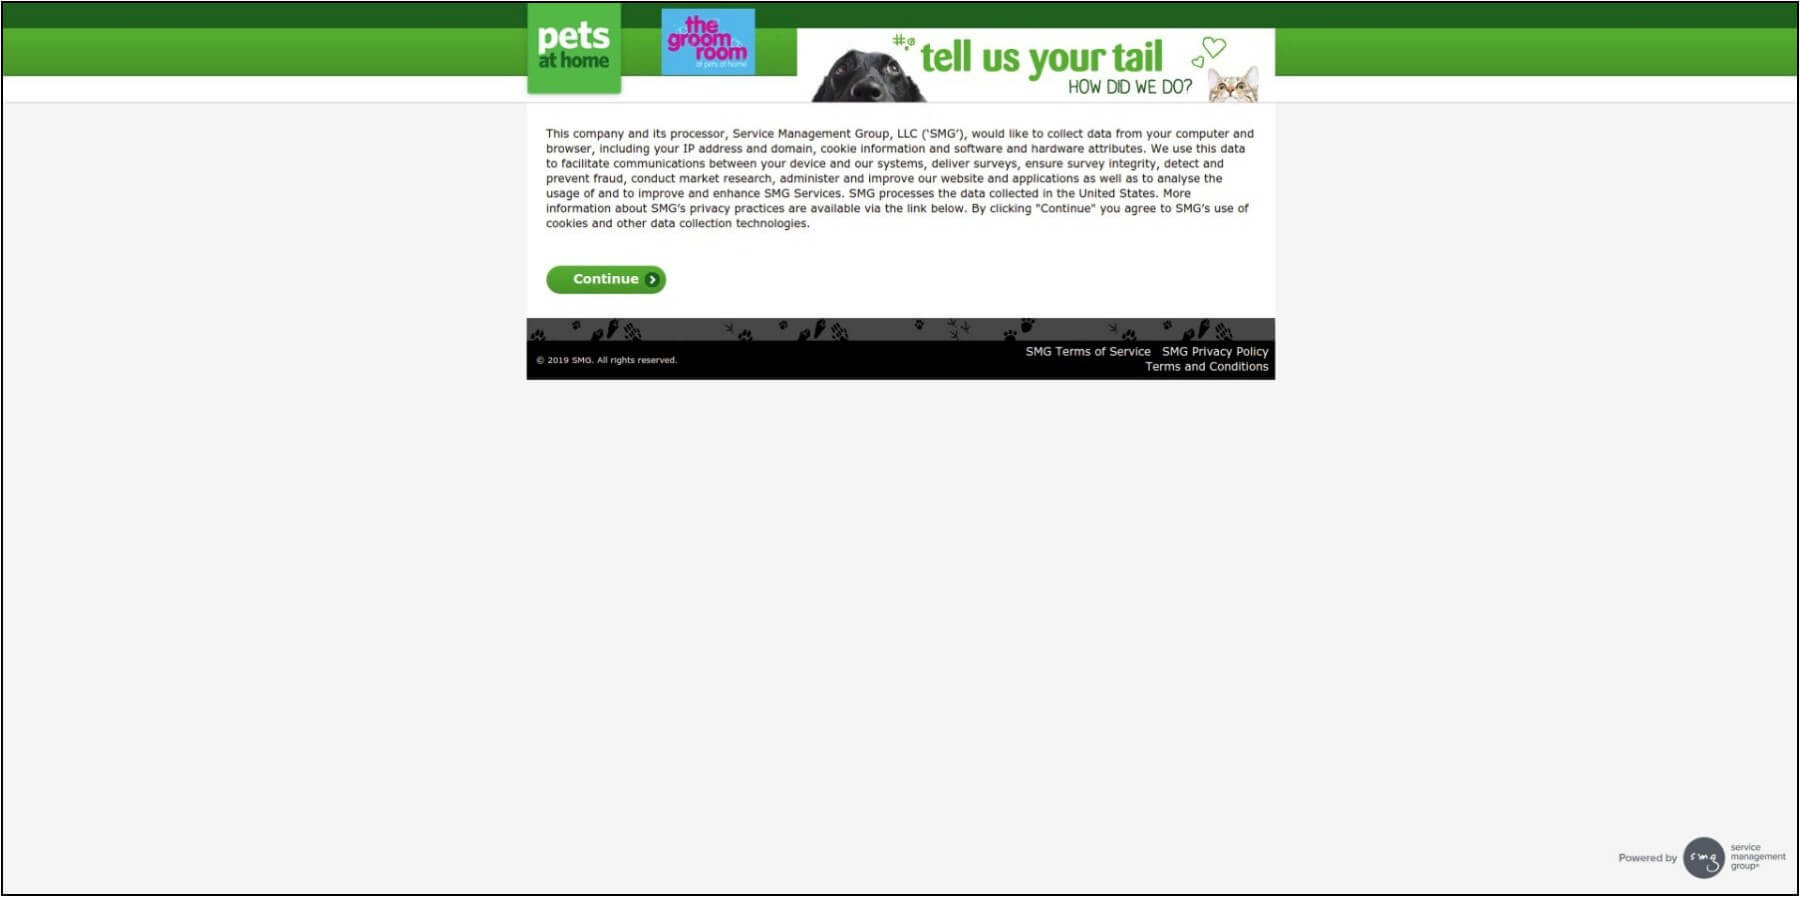 www.TellUsYourTail.com